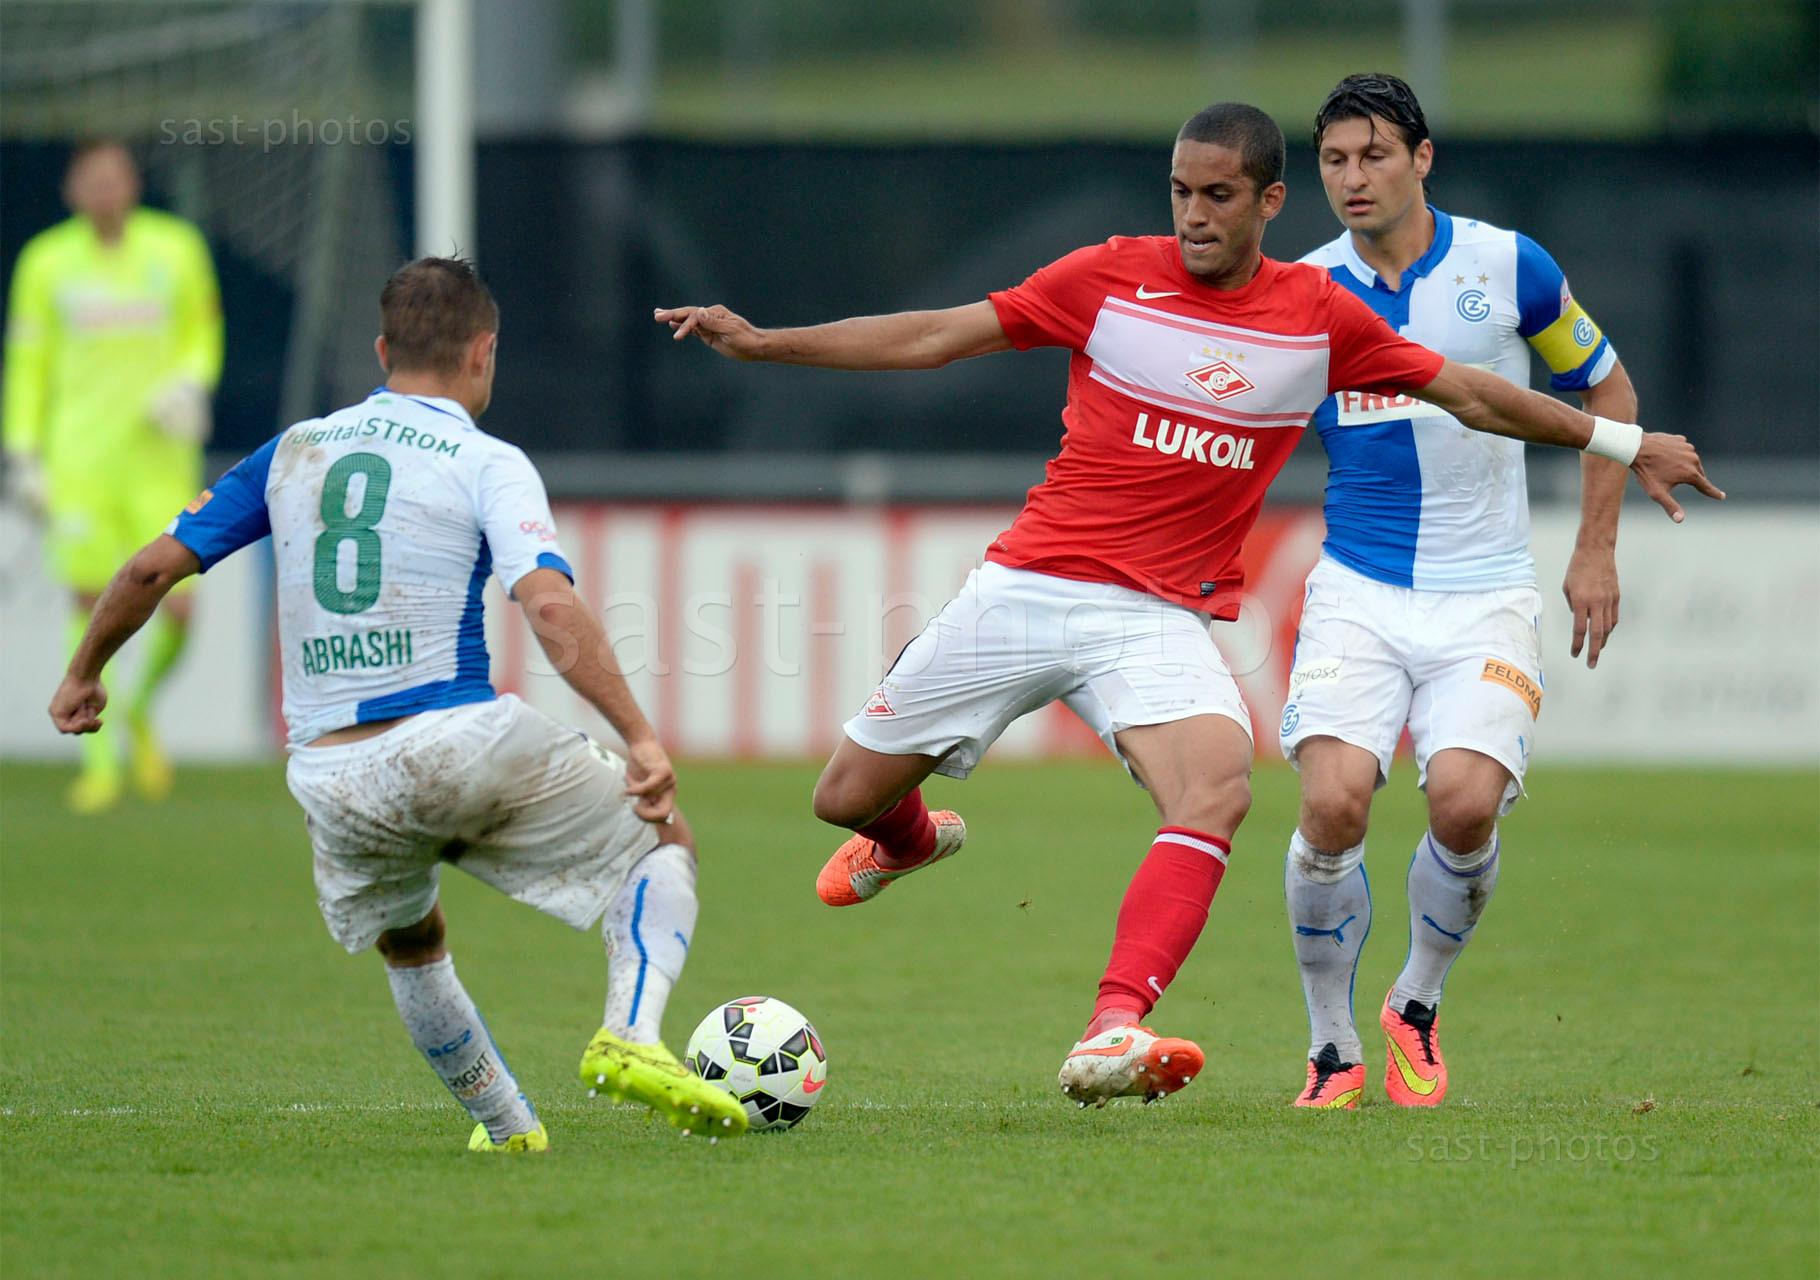 Romulo Borjes Monteira (Spartak) gegen Amir Abrashi (L. GCZ) und Veroljub Salatic (GCZ)